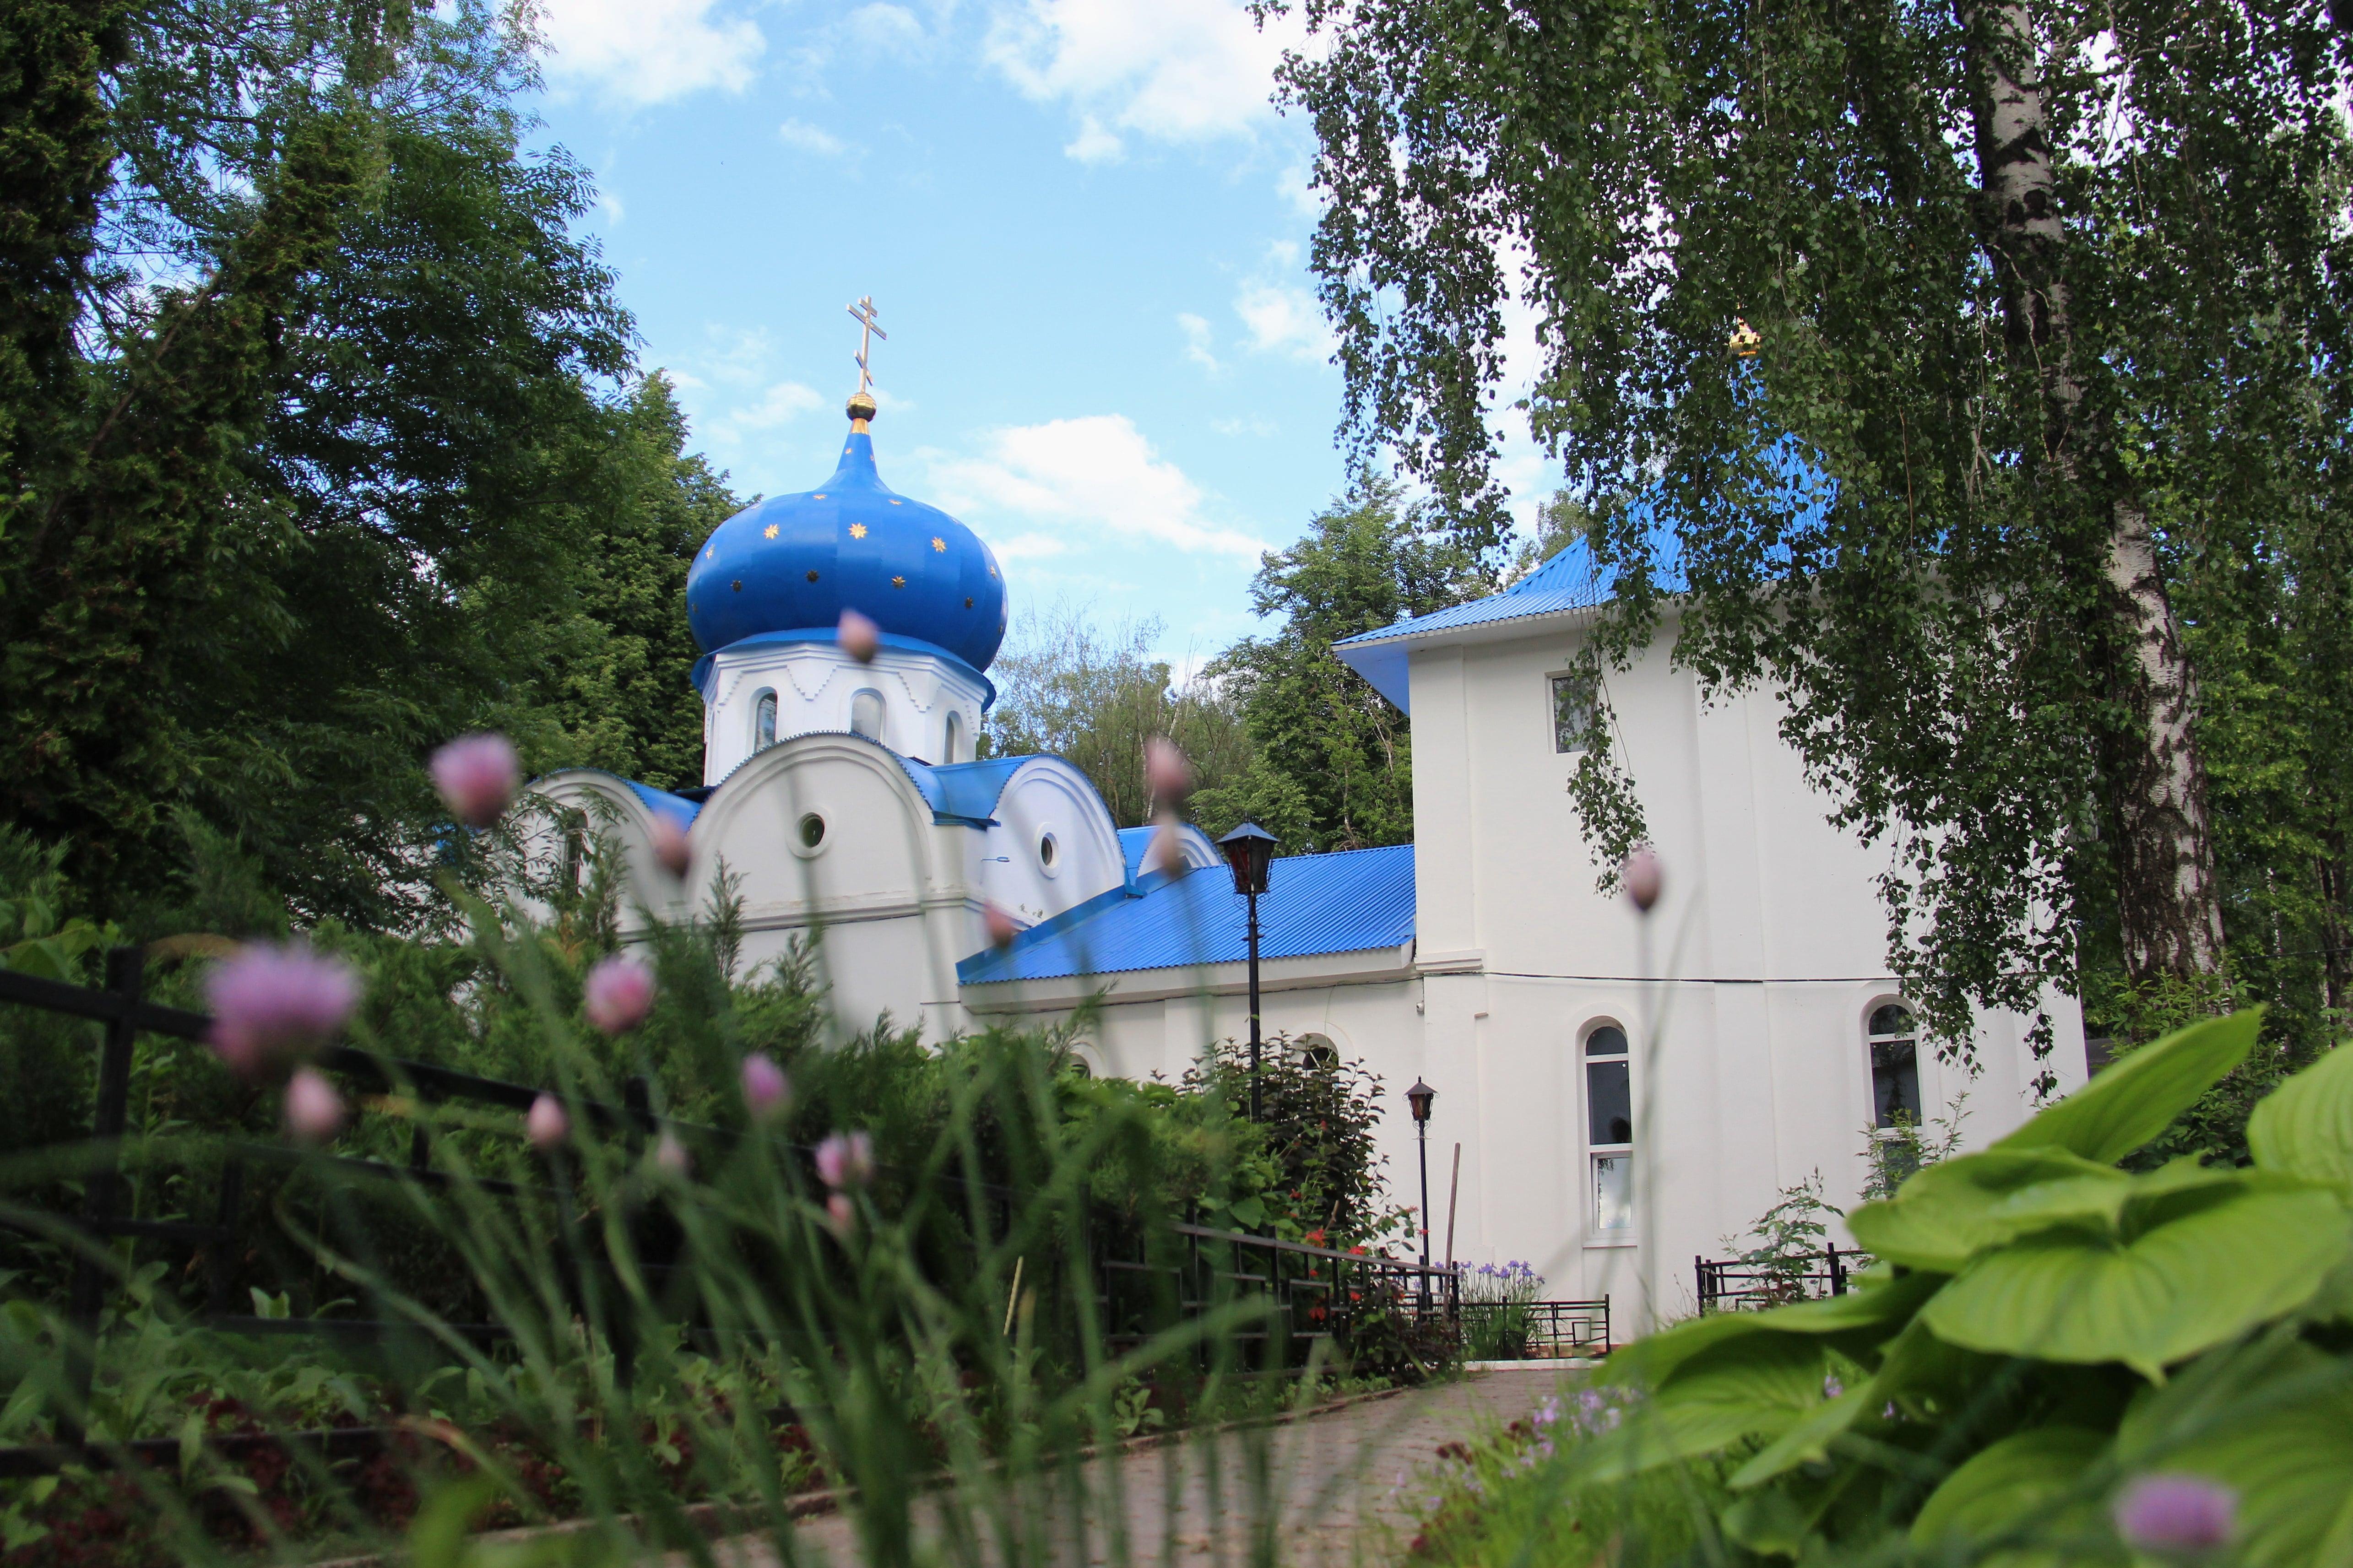 http://monuspen.ru/photoreports/f0fd1d8b1ea6bf9e46e234a1b58ab417.JPG